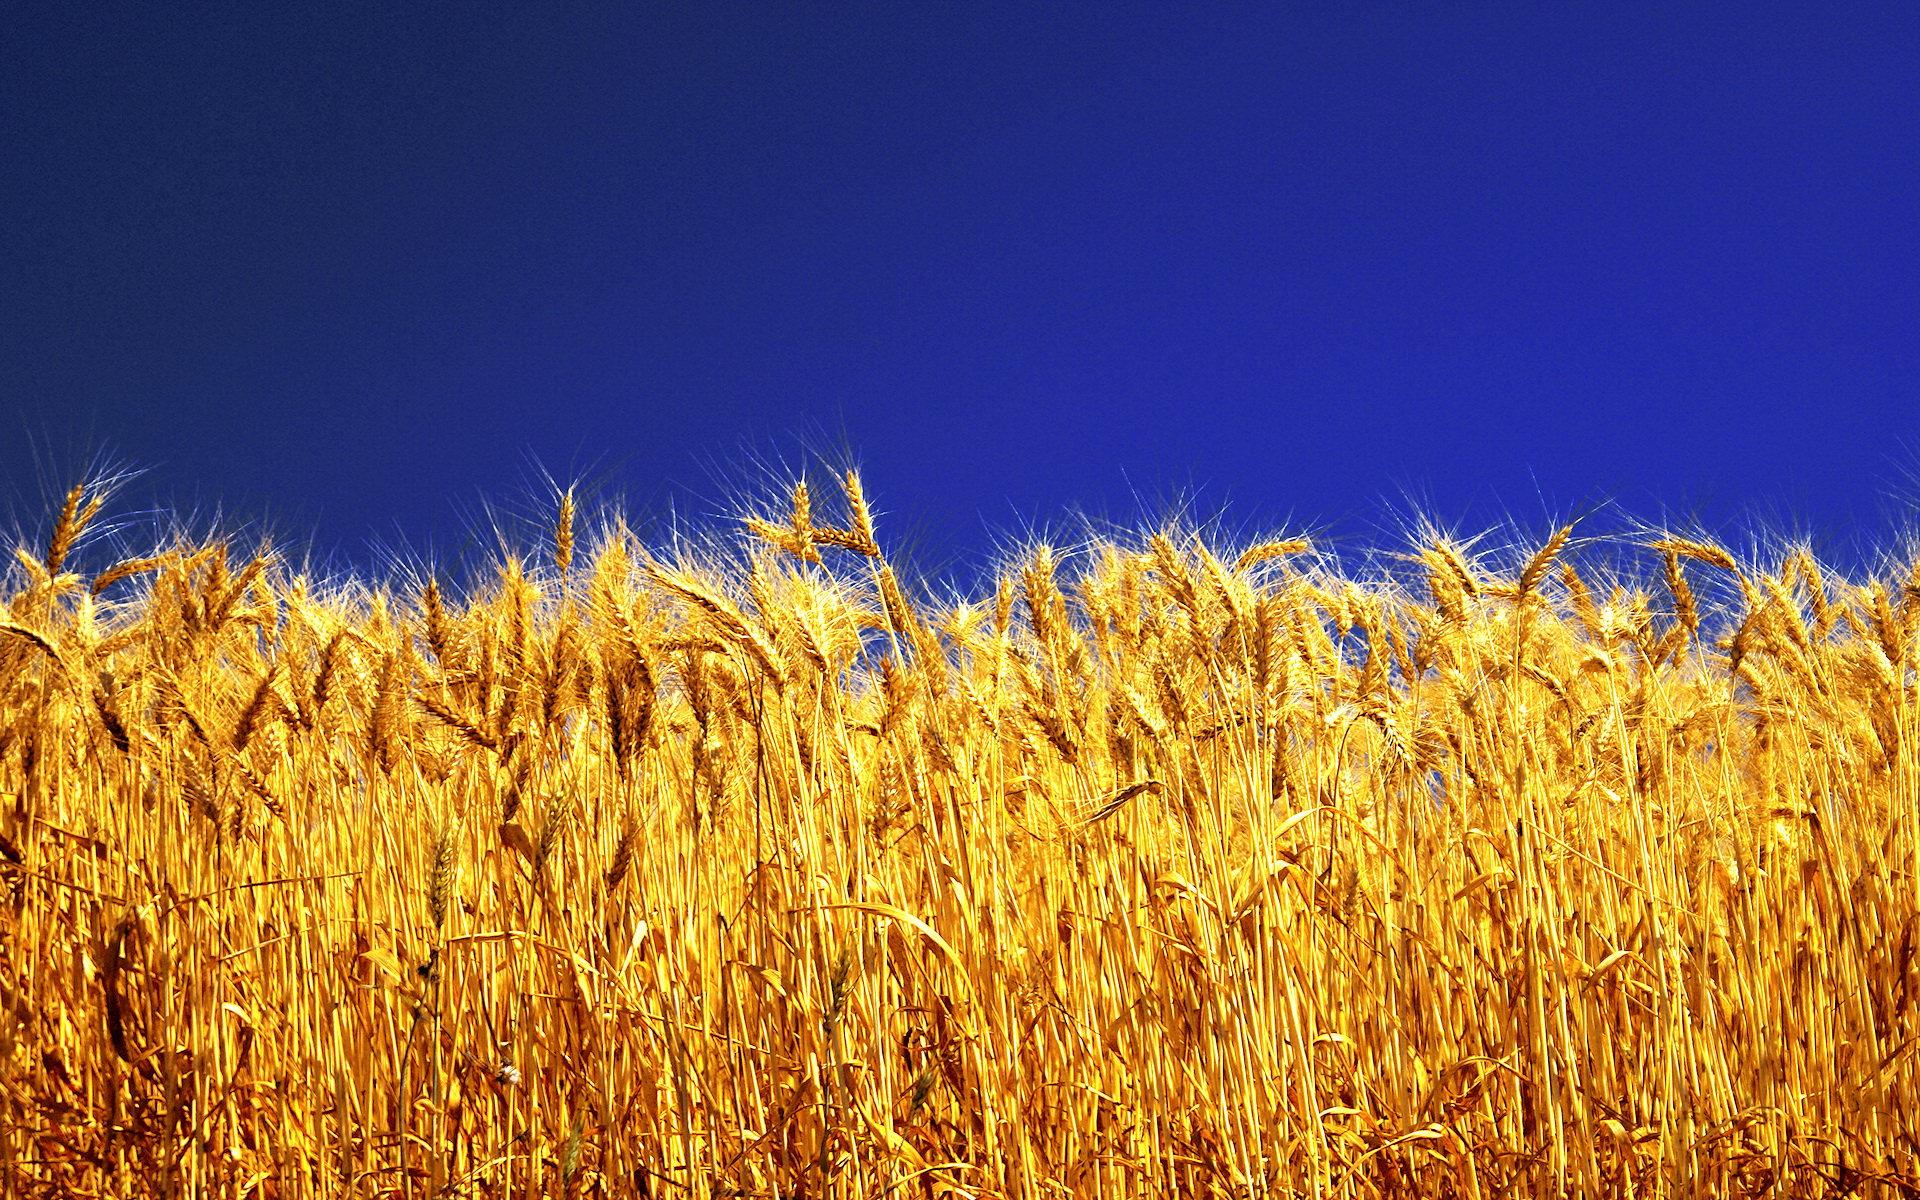 Stunning Barley Wallpaper 35395 1920x1200 px